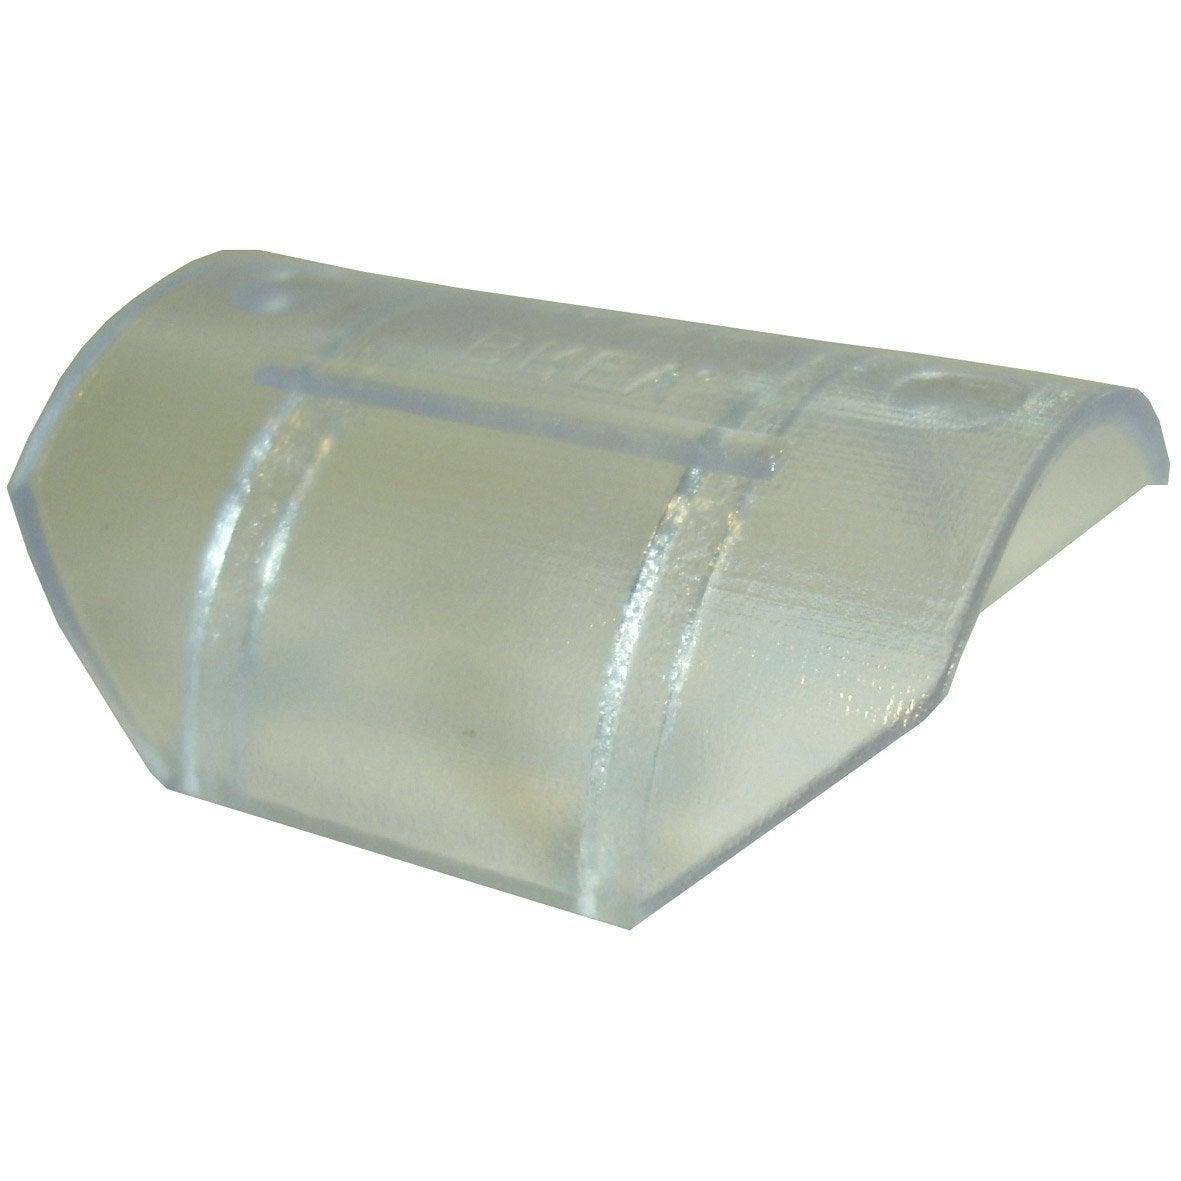 glisseurs tringle rideau design 28 mm plastique transparent leroy merlin. Black Bedroom Furniture Sets. Home Design Ideas